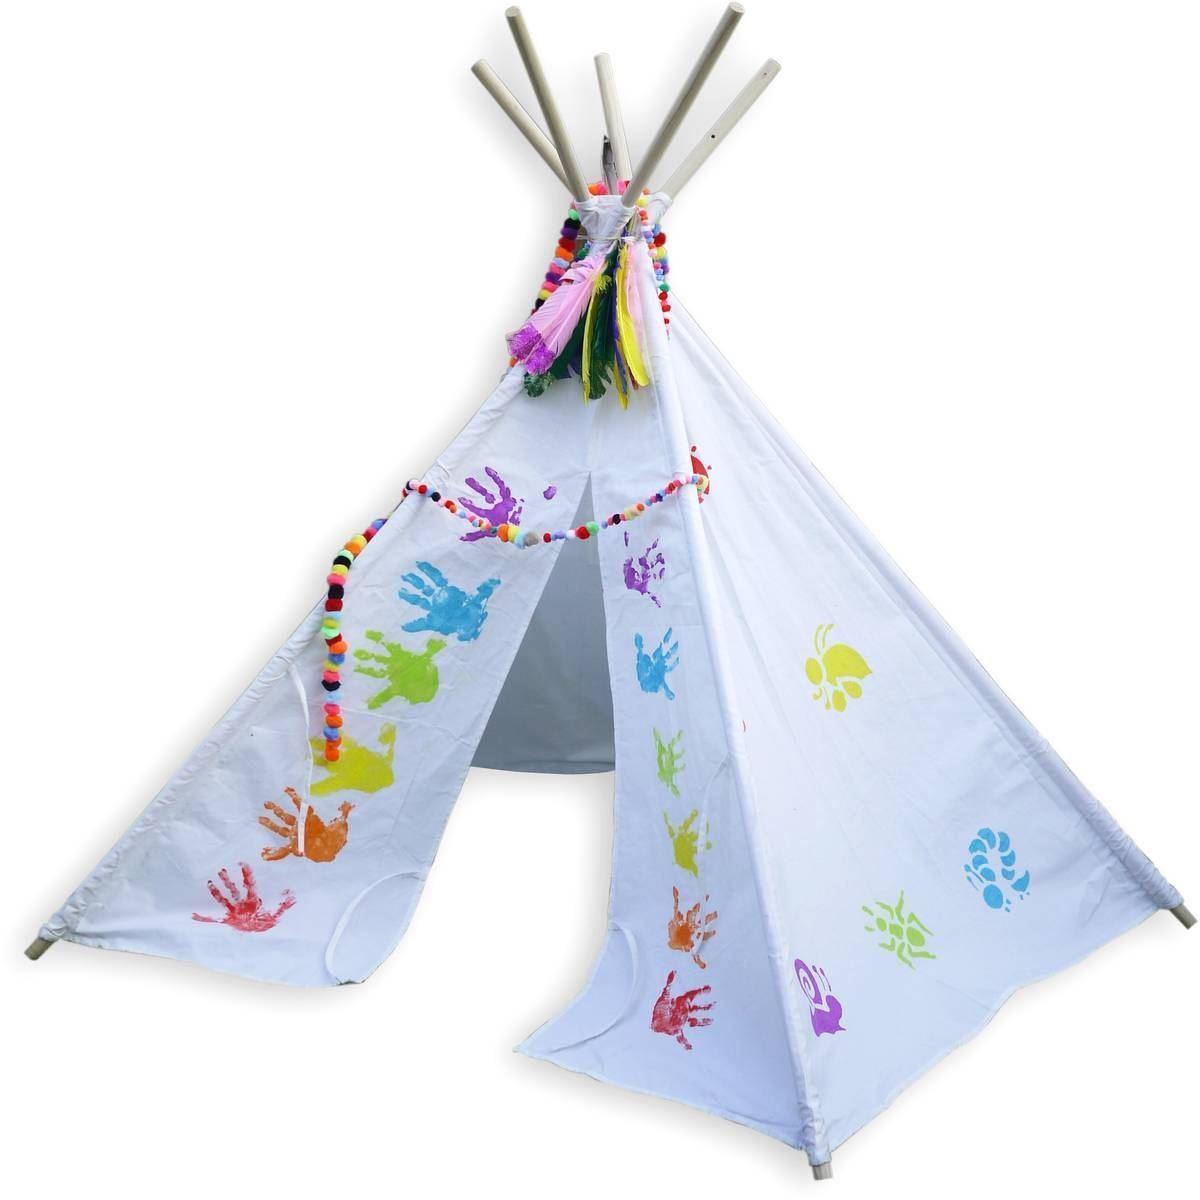 Childrens Kids Teepee Play Tent Indoor Outdoor Large 140 x ...